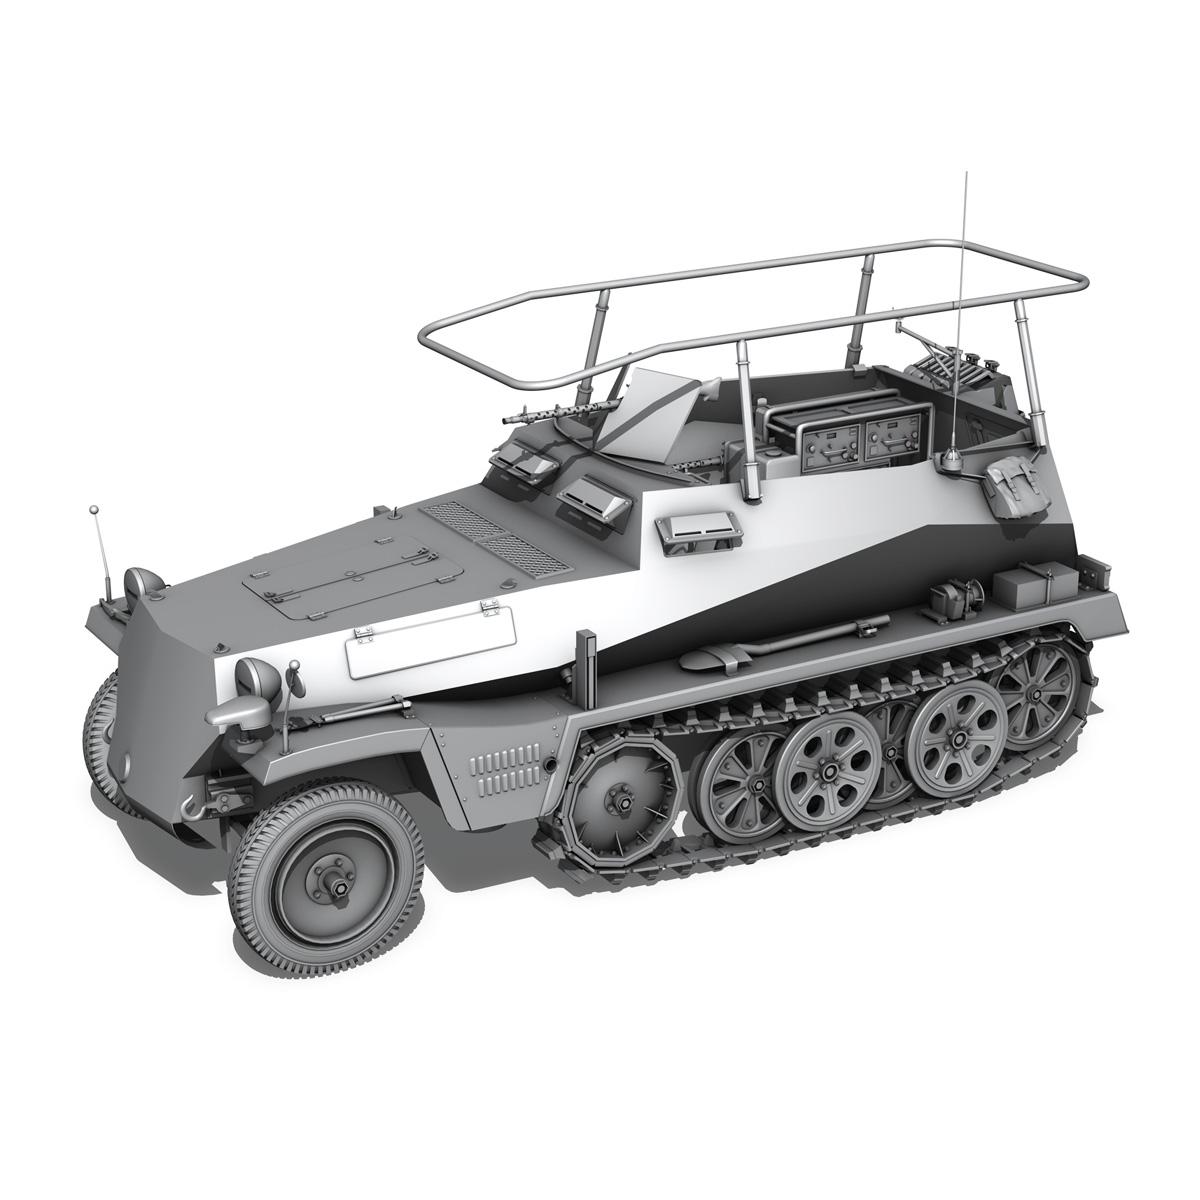 sdkfz 250 – command halftrack 3d model 3ds fbx c4d lwo obj 251670